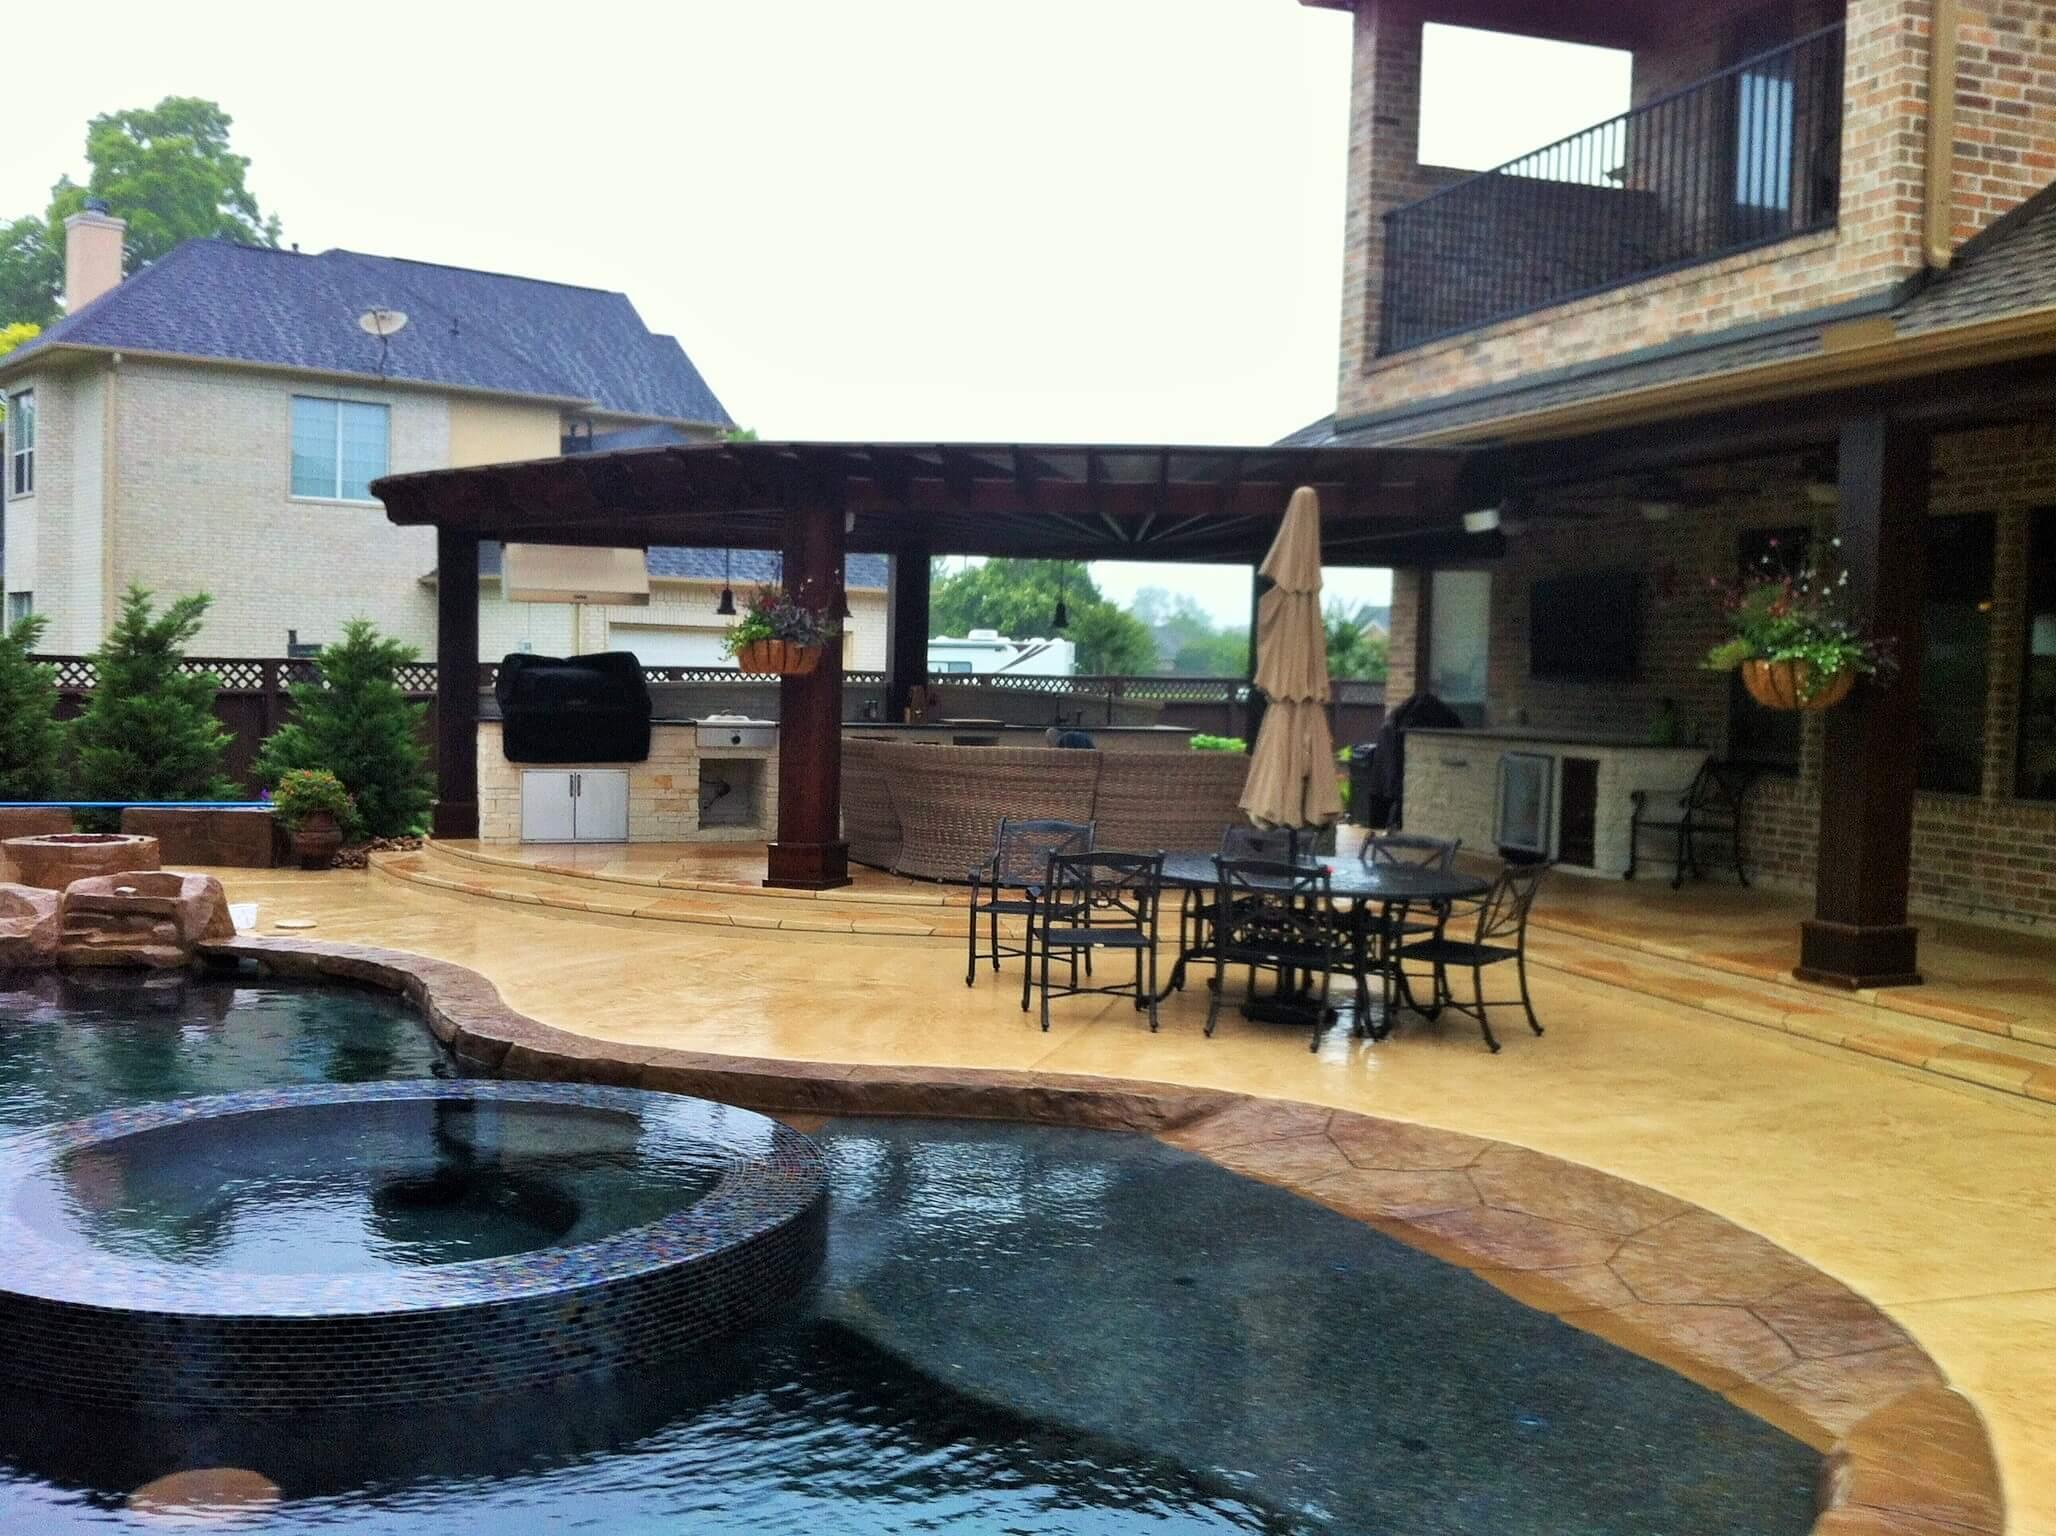 5 Pool Design & Outdoor Living Ideas to Modernize Your ... on Designer Outdoor Living id=50718